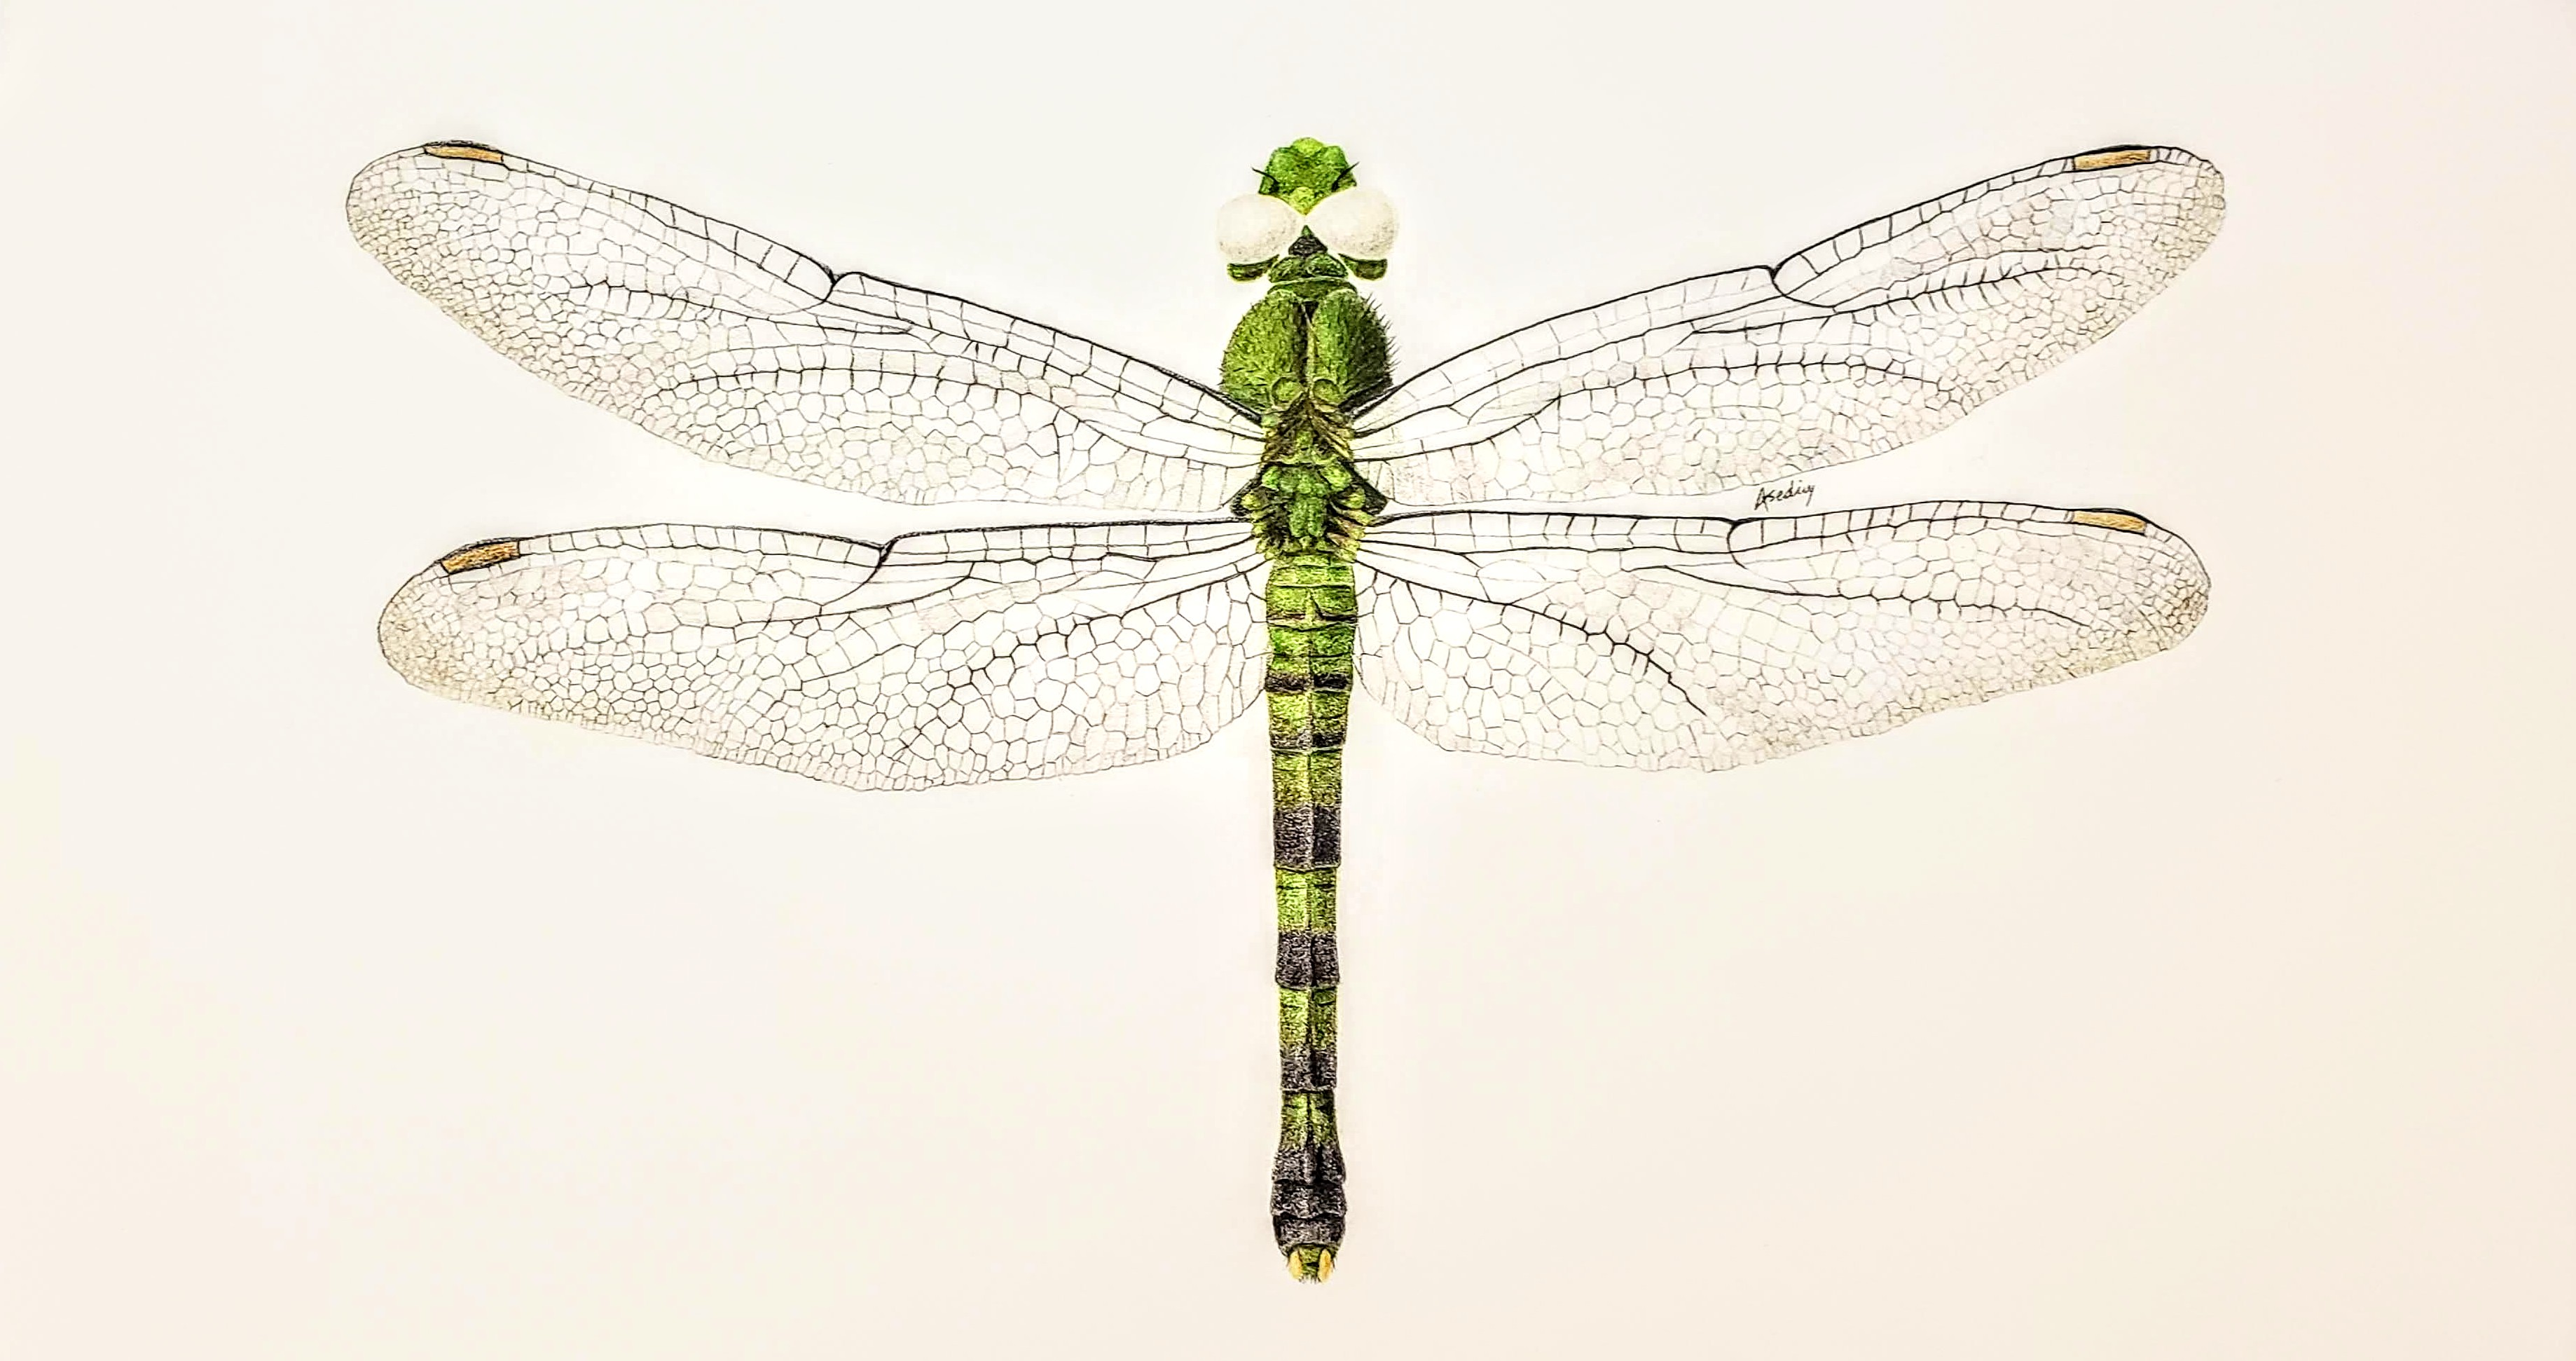 Odonata Libellulidae Erythemis simplicicollis pencil drawing by Aaron Sedivy